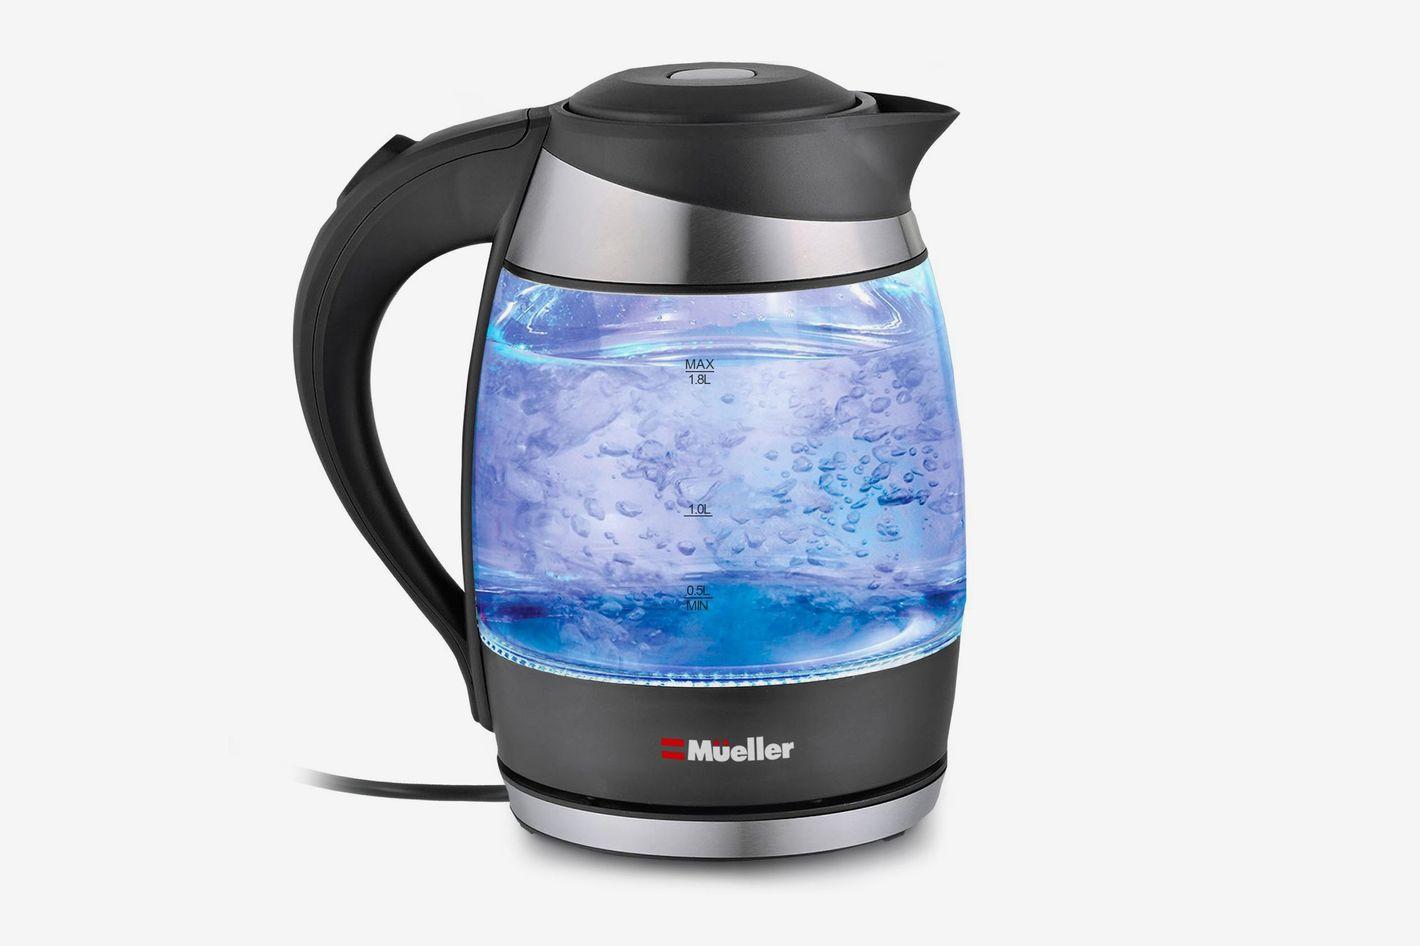 Mueller Austria Glass Electric Kettle Water Heater With SpeedBoil Tech